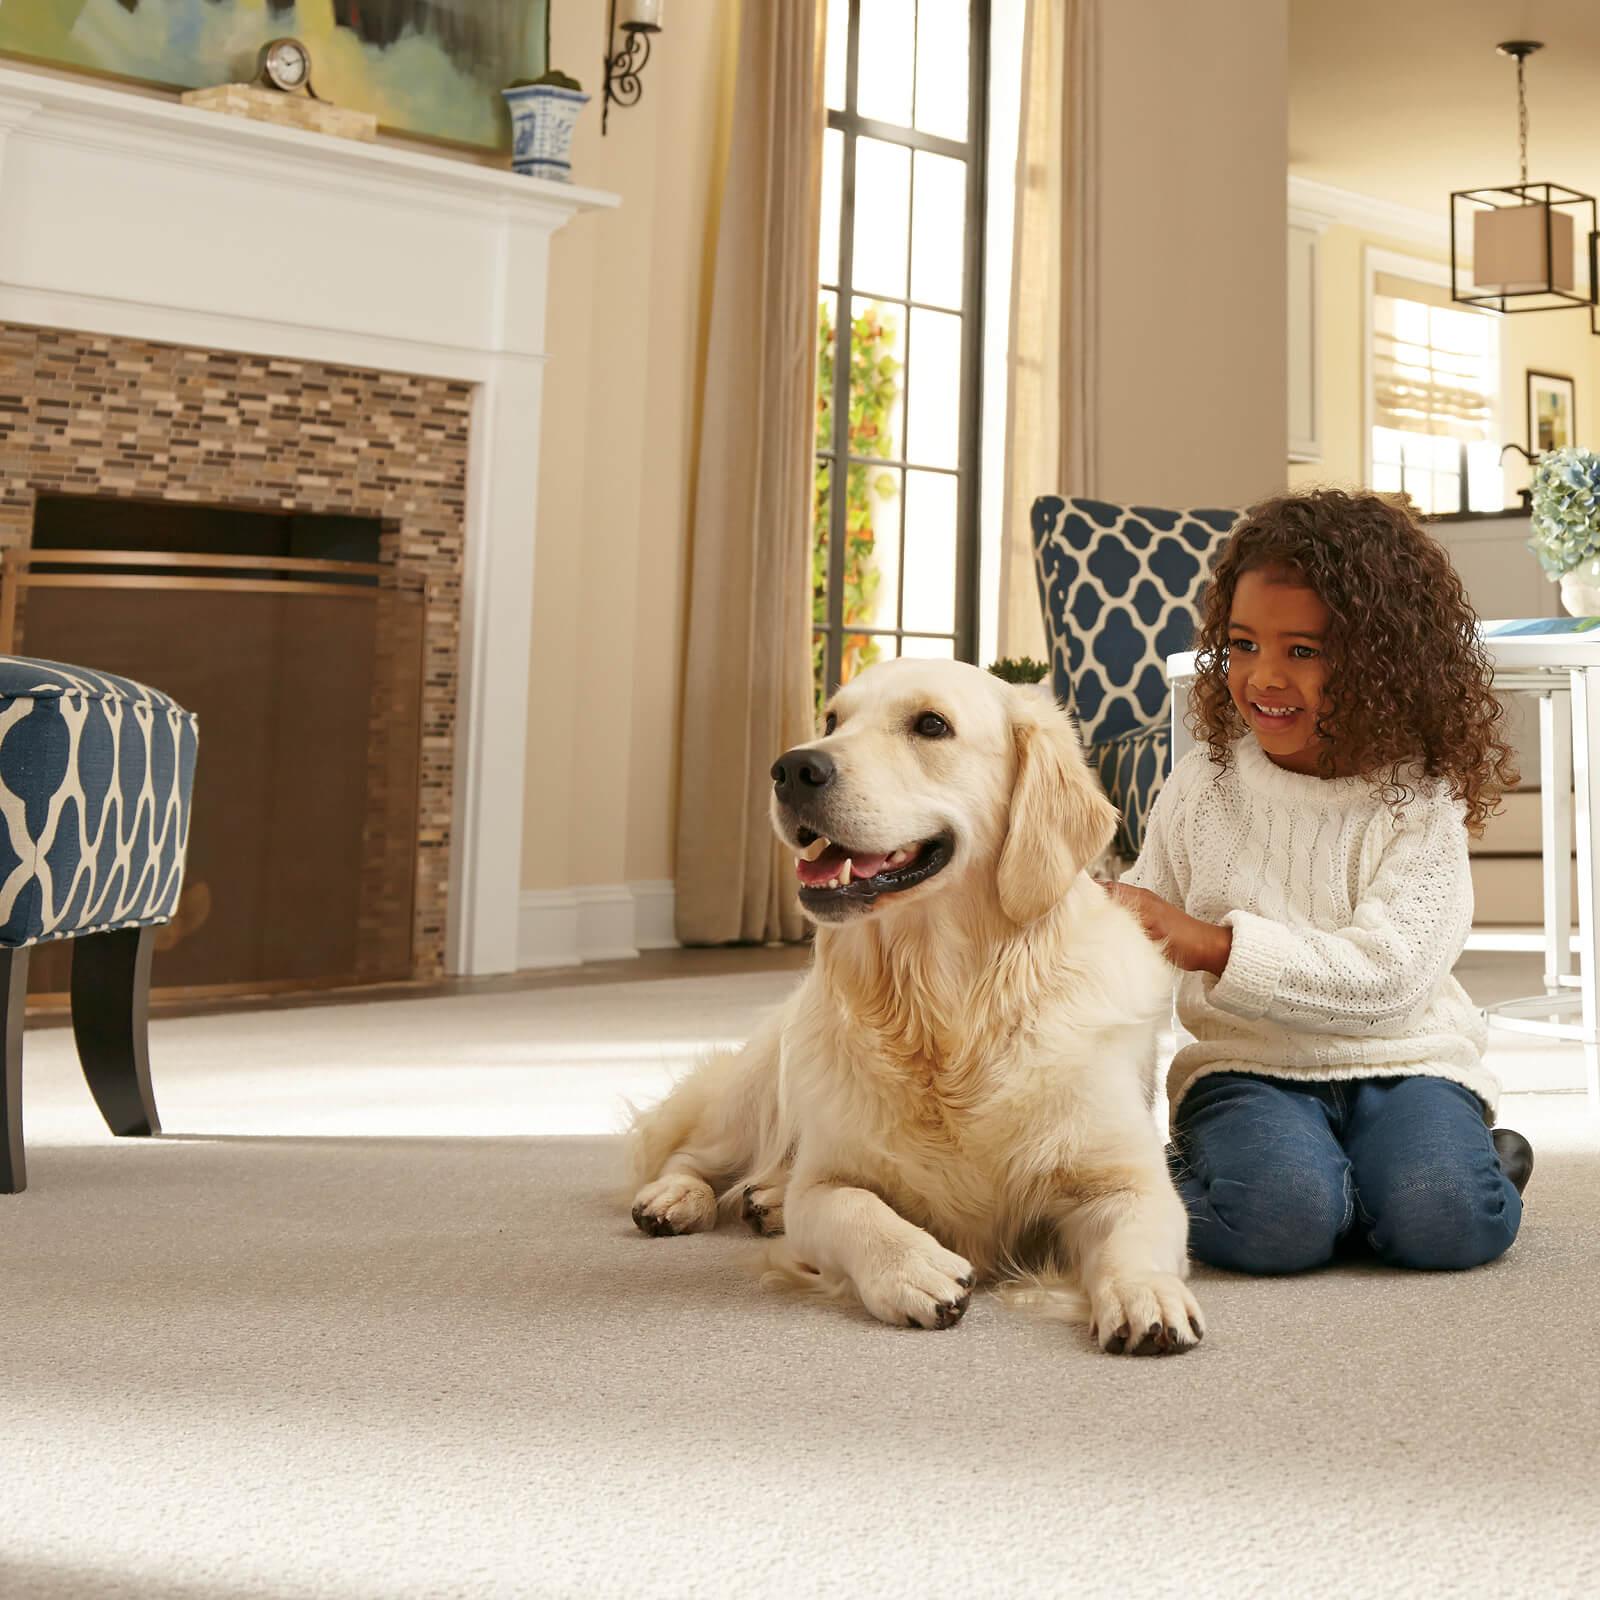 Kid with pet on carpet | Dolphin Carpet & Tile